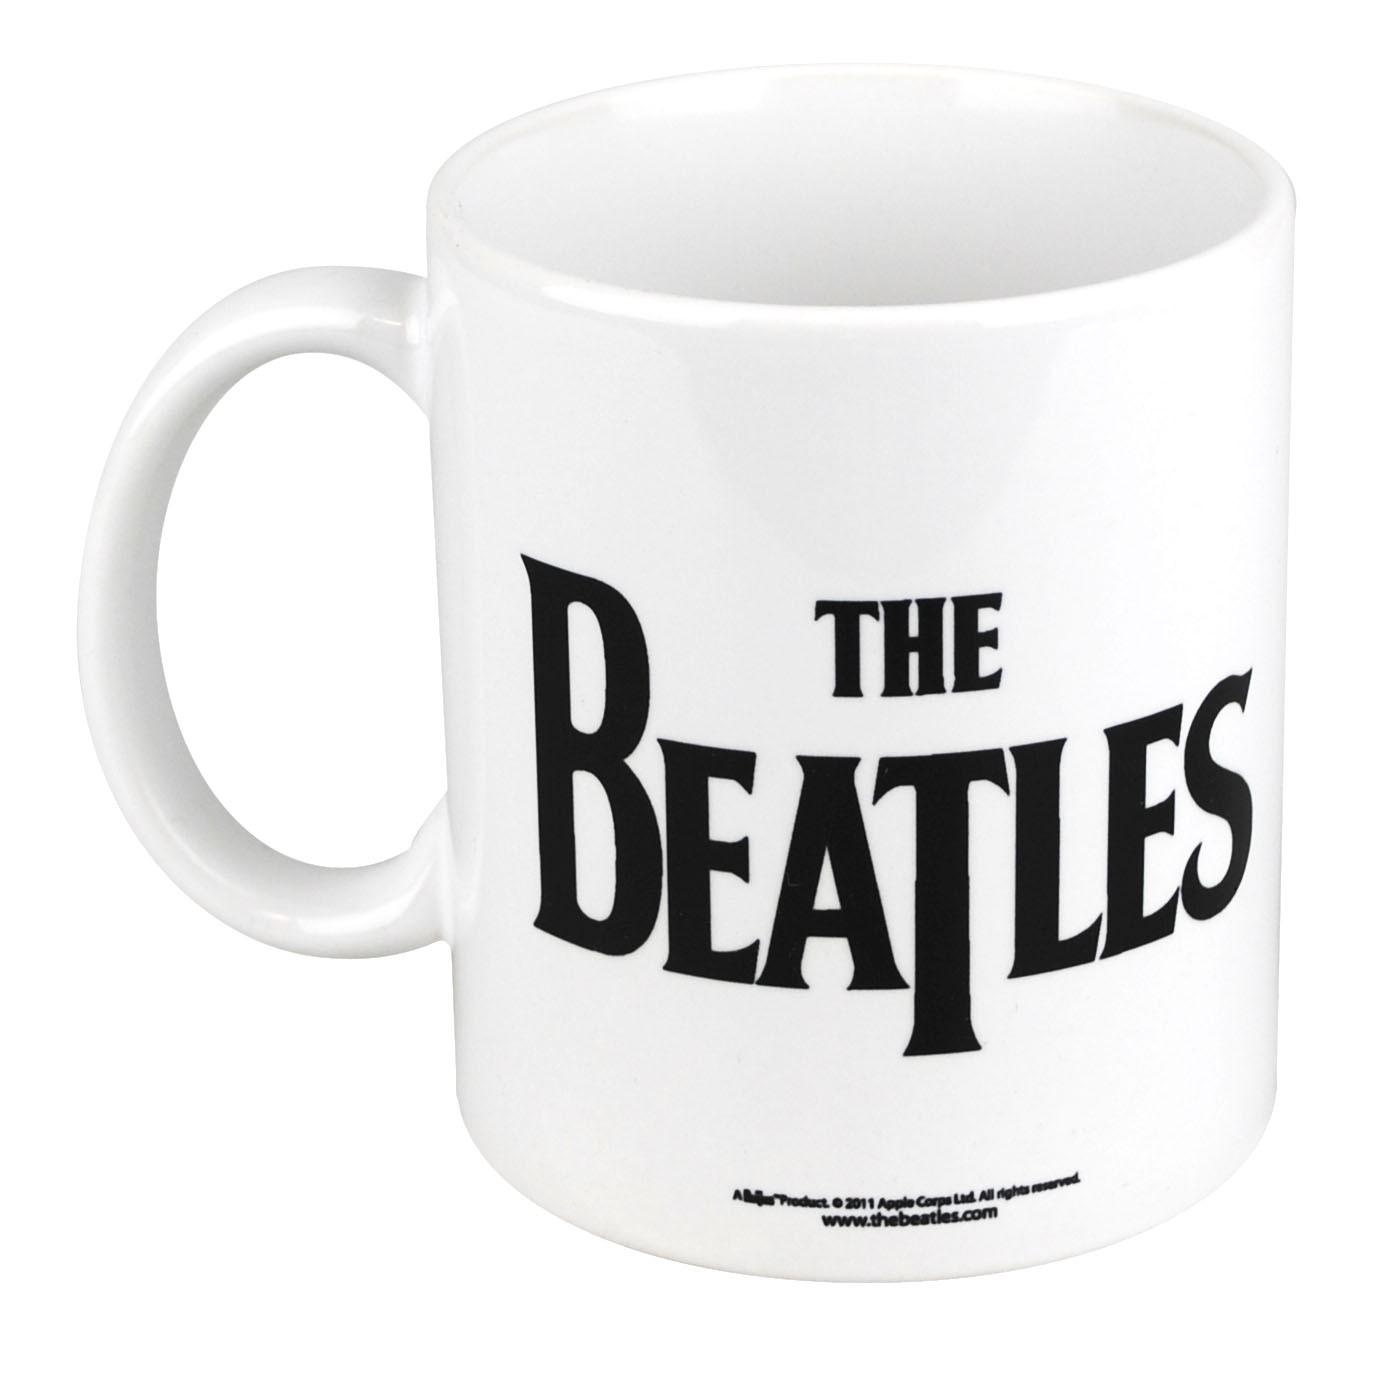 NEW THE BEATLES CLASSIC PHOTO MUG RETRO CERAMIC CUP COFFEE TEA LENNON MCCARTNEY